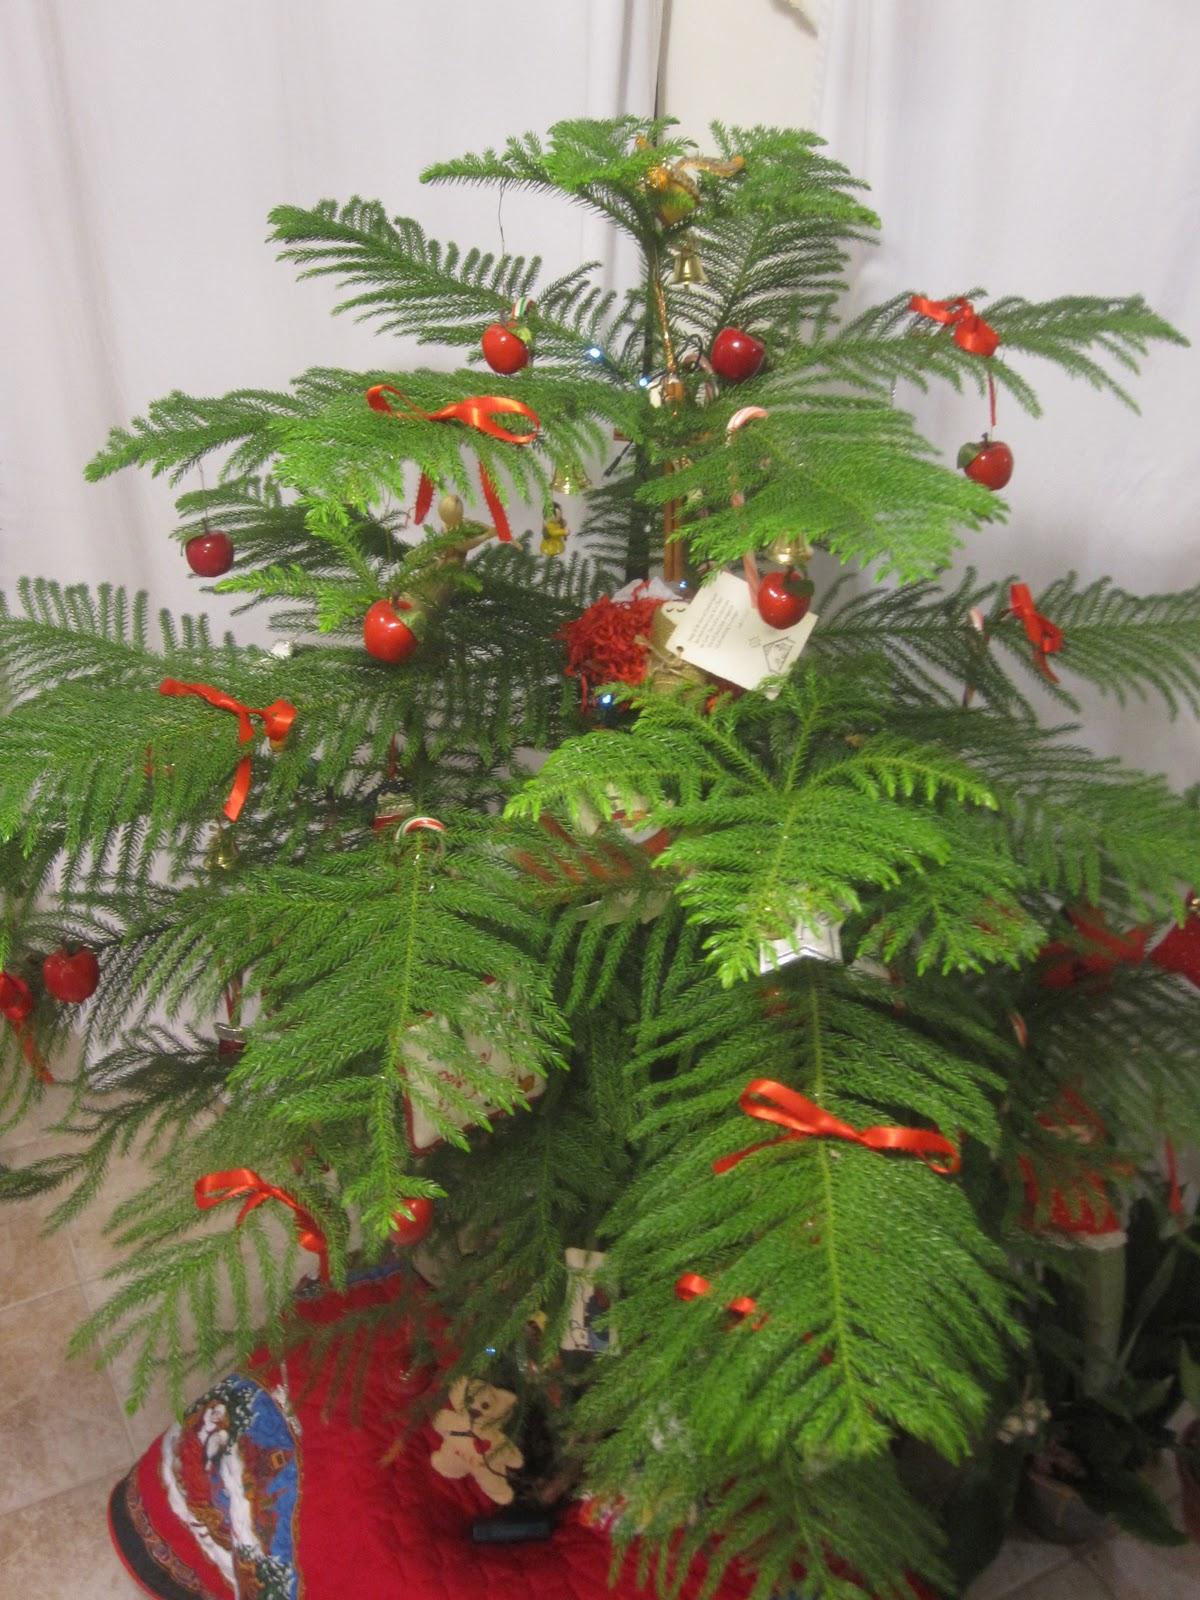 Tropical Texana: NORFOLK ISLAND PINE CHRISTMAS TREE ~ THIS YEAR\'S TREE